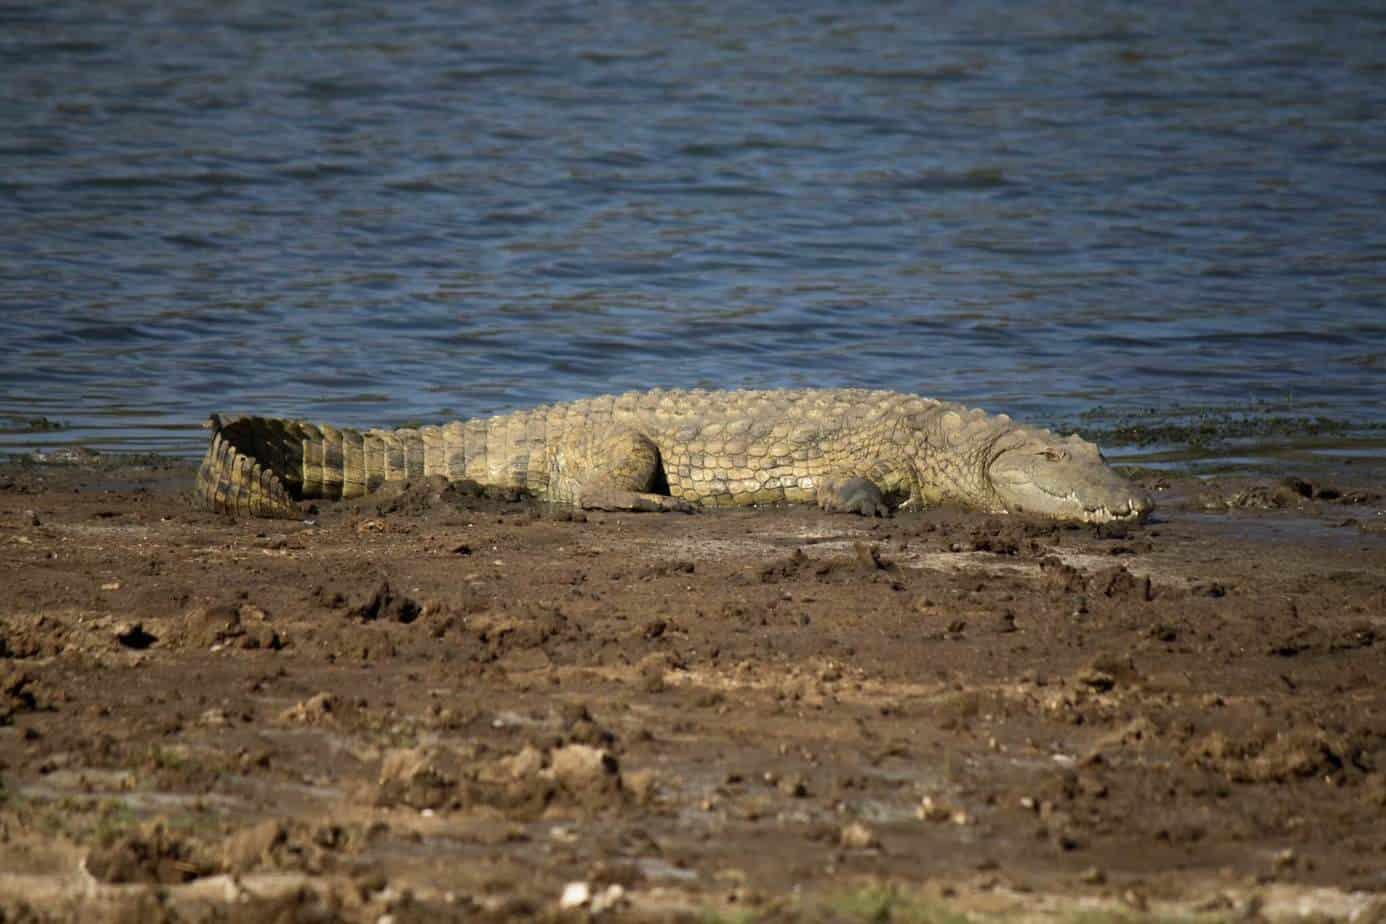 Nile Crocodile @ Ndumo Game Reserve. Photo: Håvard Rosenlund